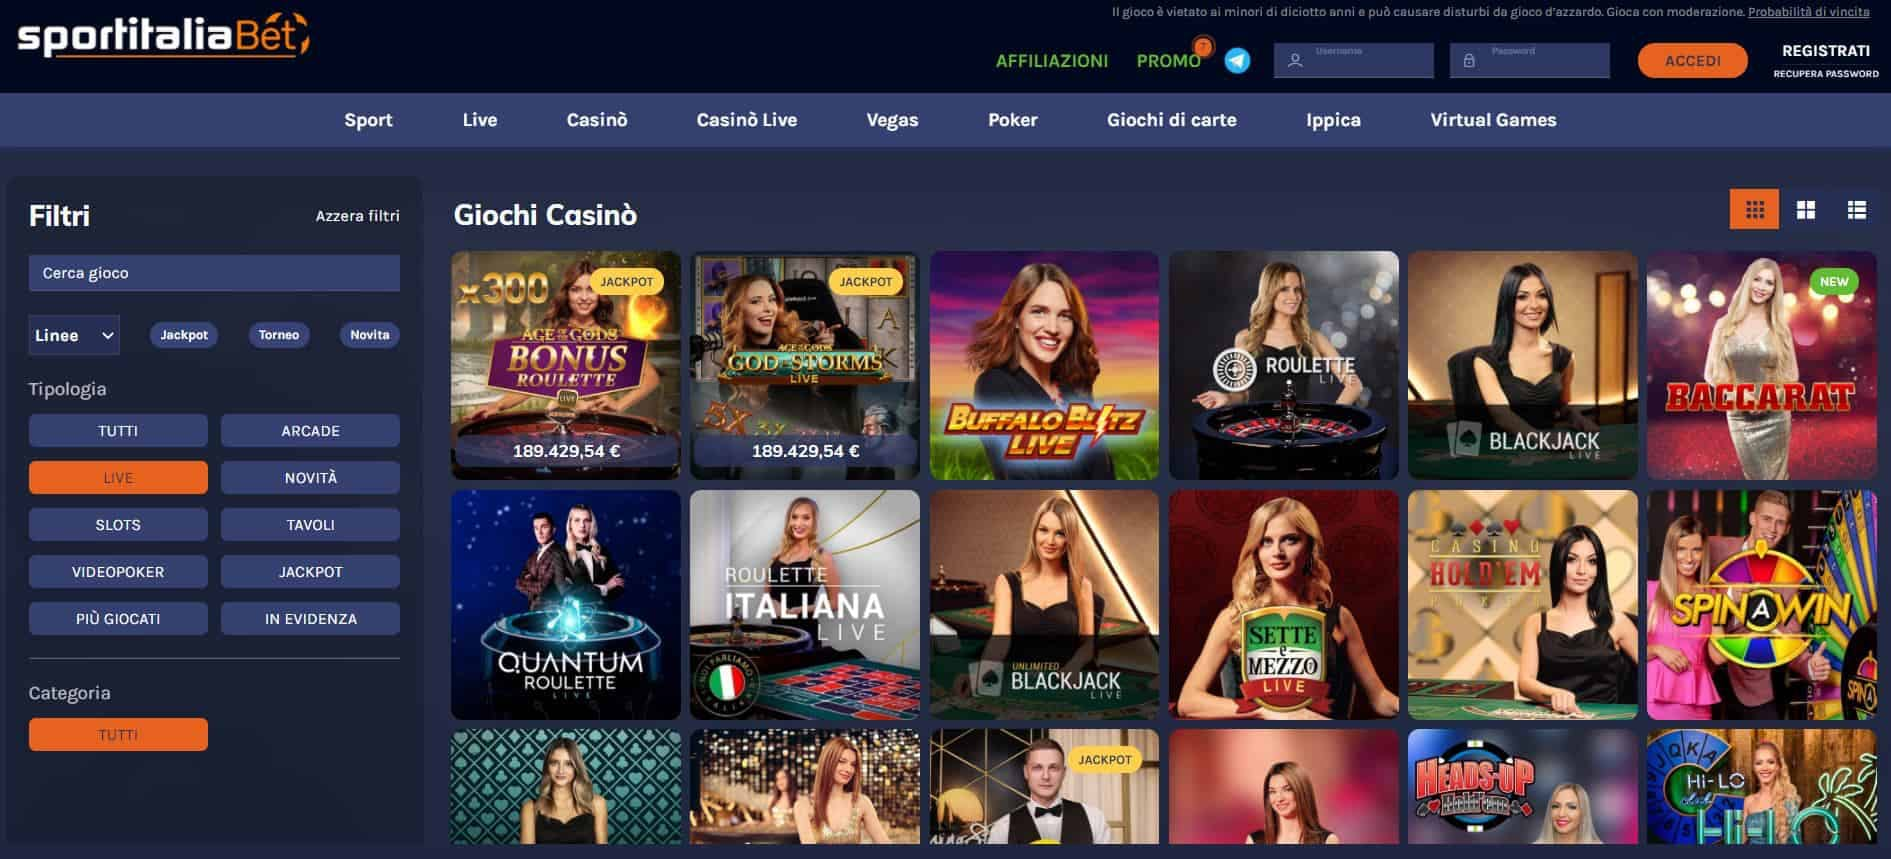 Il casino dal vivo diSportitaliaBetpresenta diversi tavoli virtuali